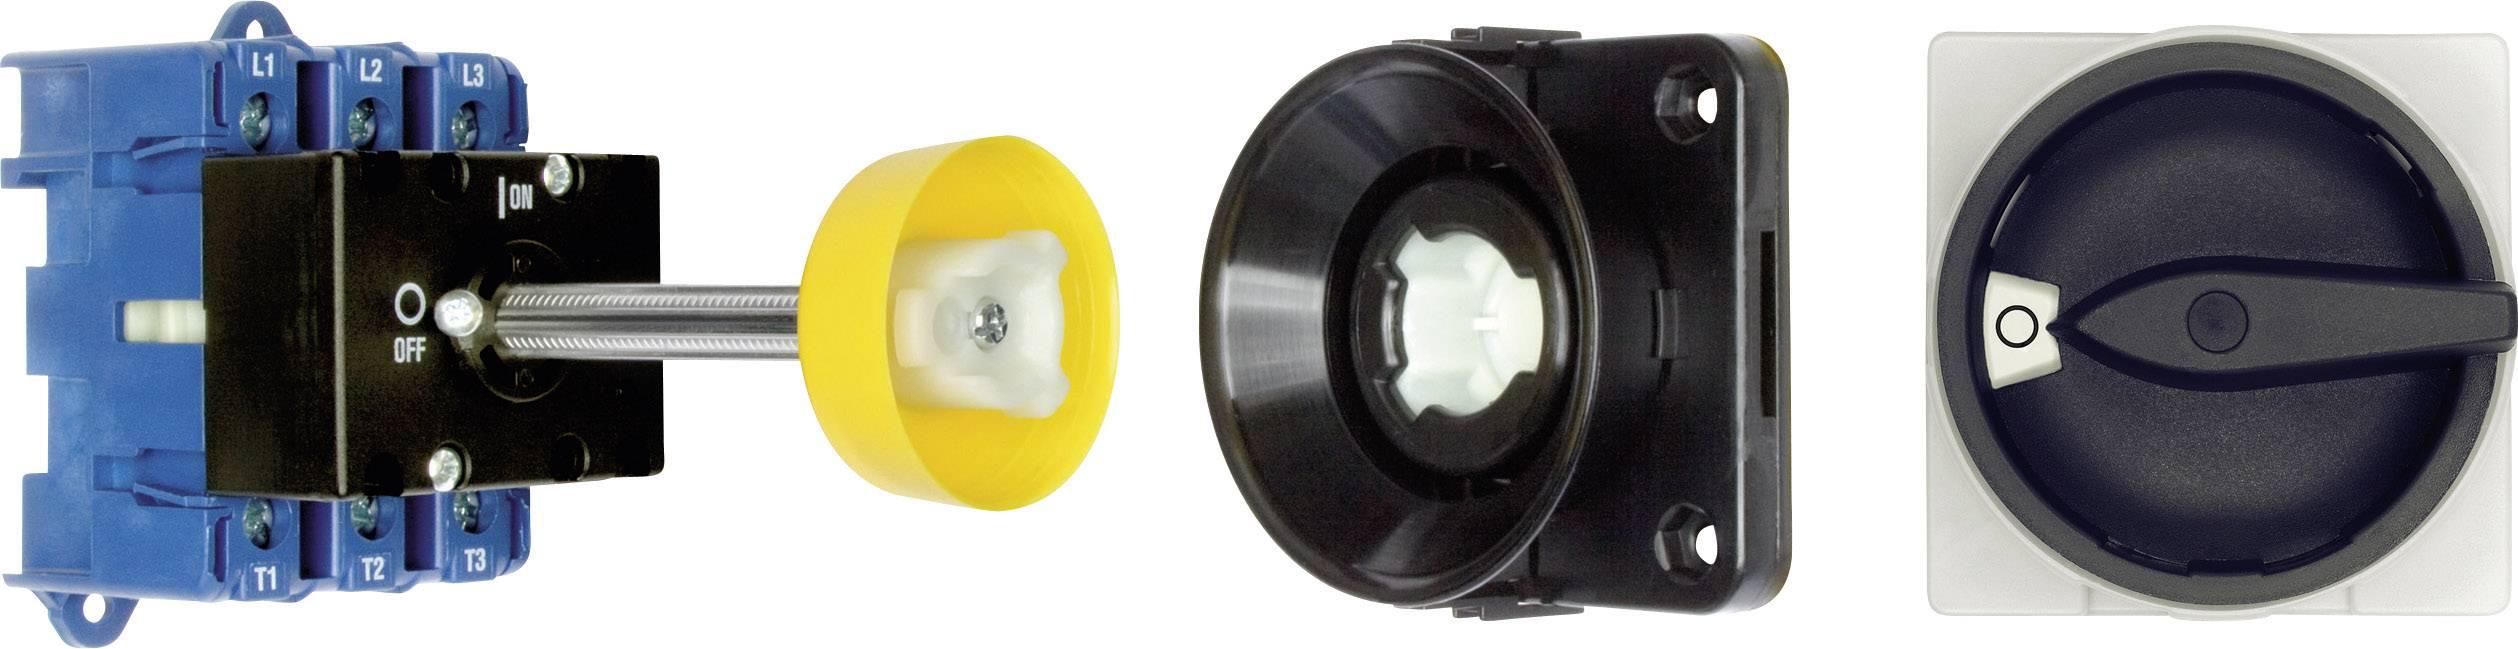 Odpínač s dvernou spojkou Kraus & Naimer KG80 T103/09 VE KG80 T103/09 VE, 80 A, 1 x 90 °, čierna, 1 ks